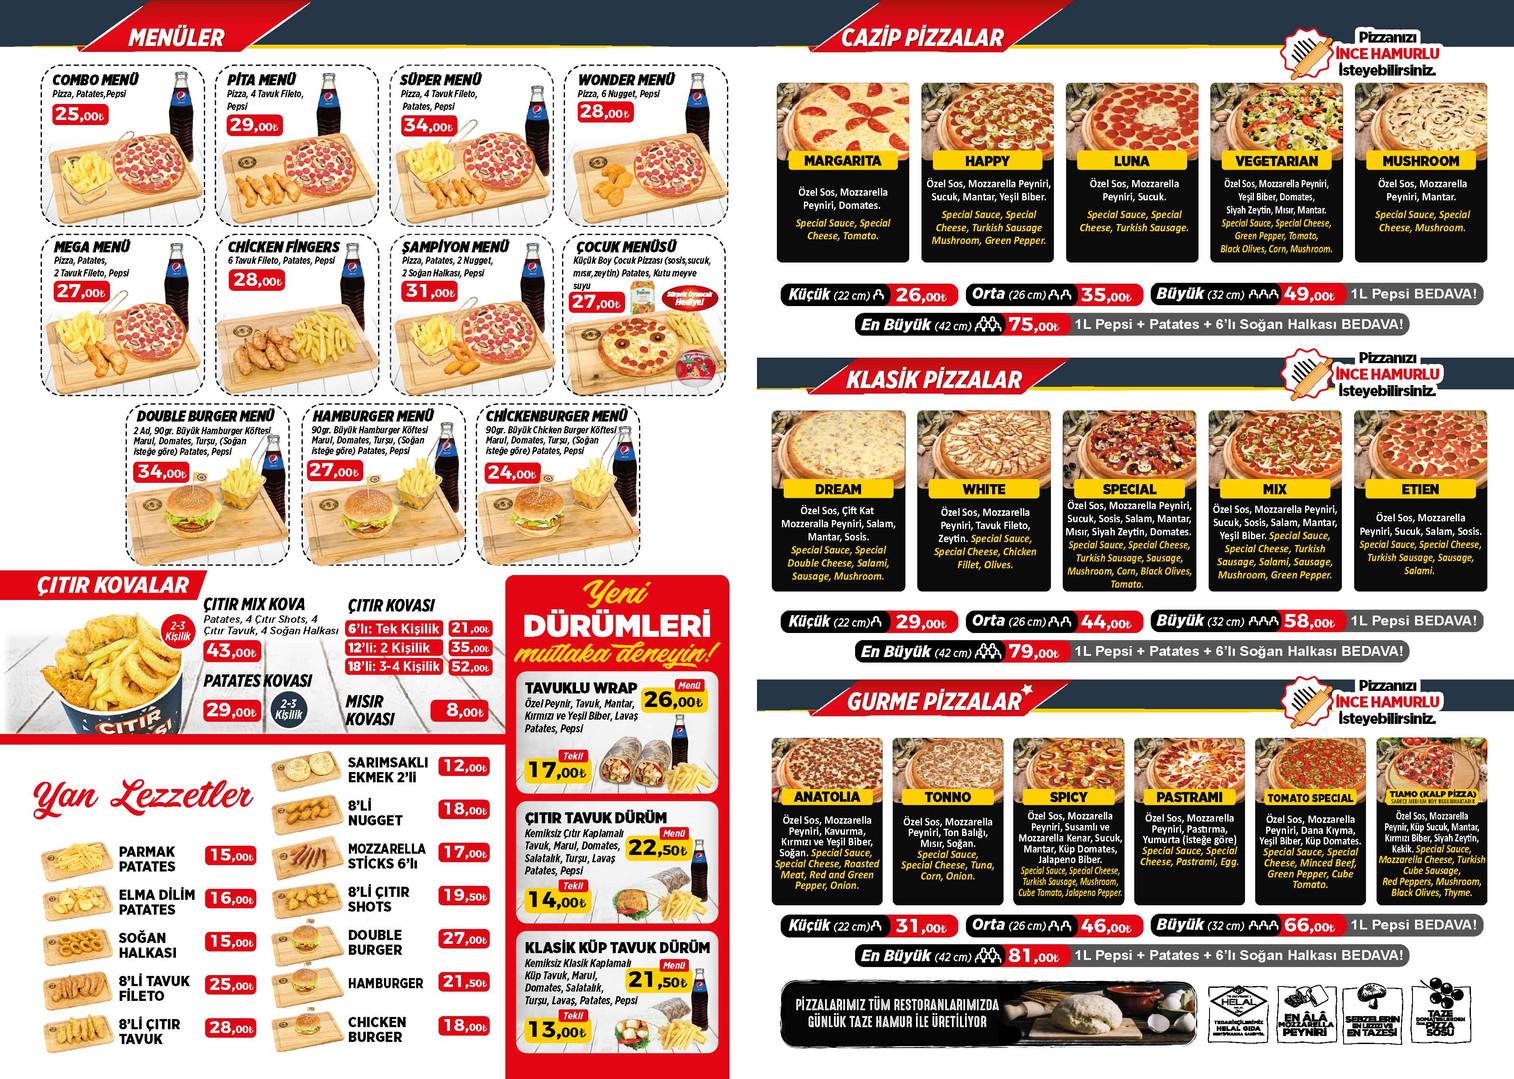 pizza-tomato-burdur-bucak-menu